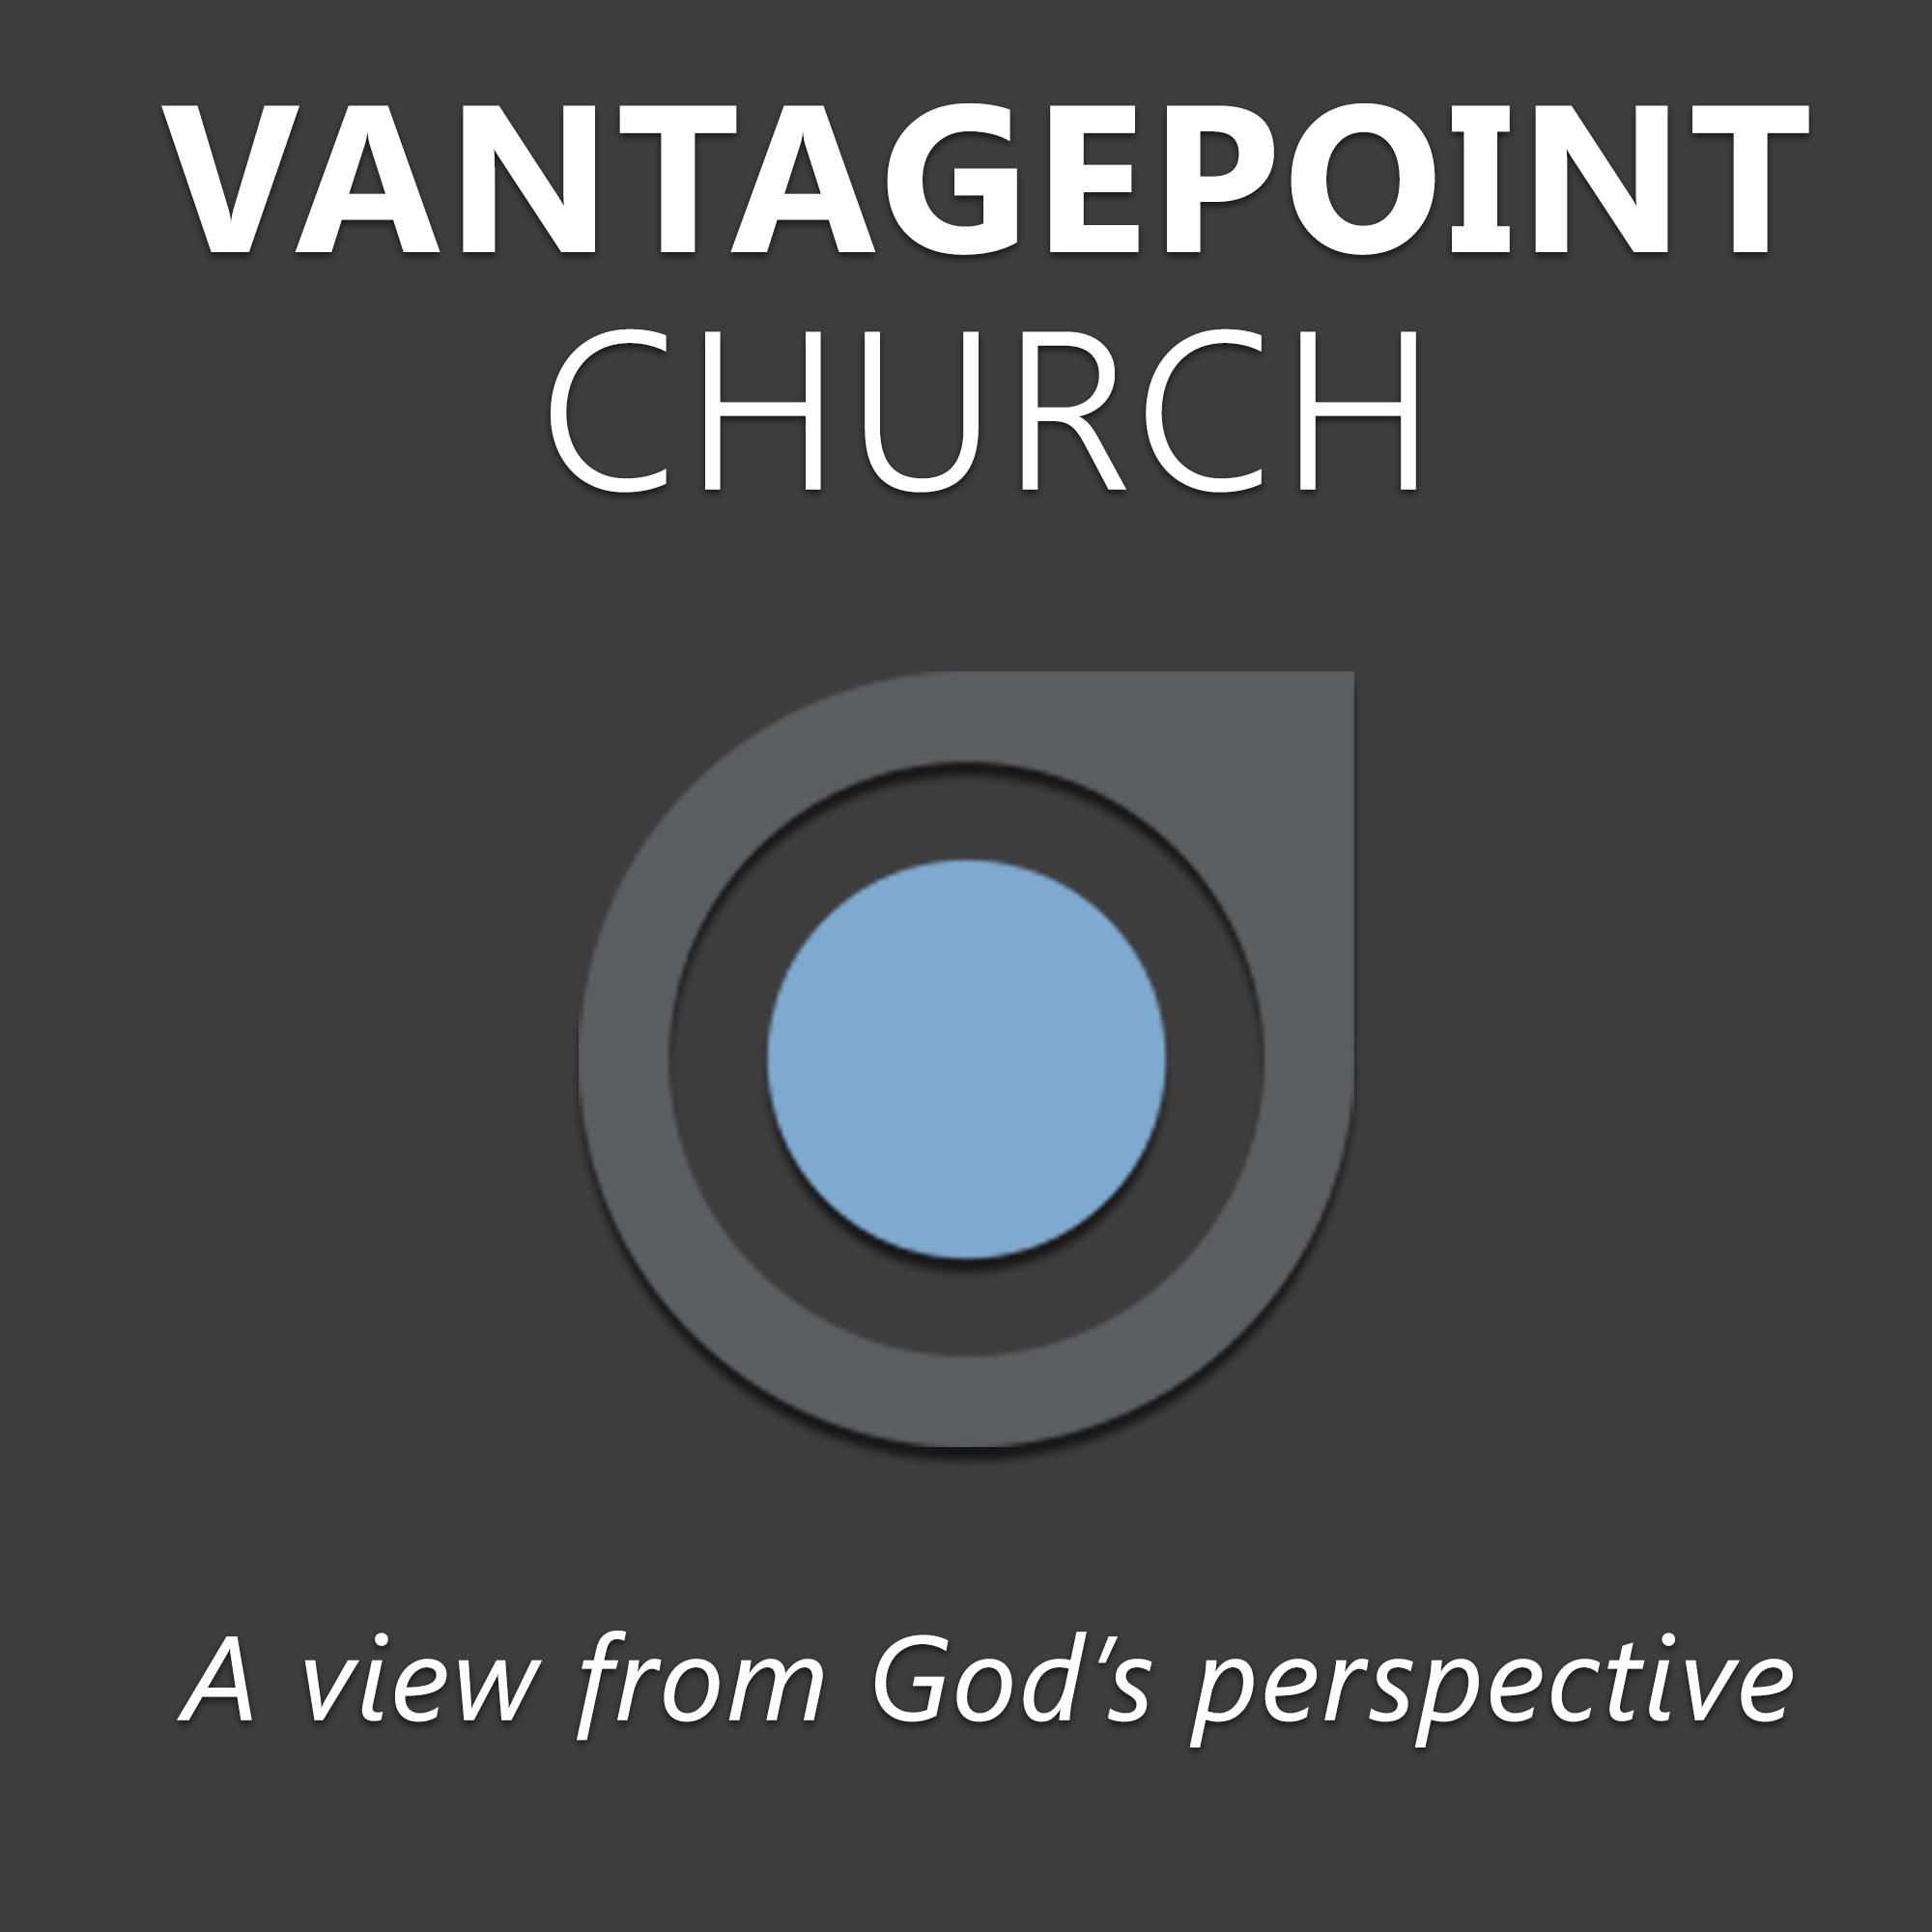 VantagePoint Church show image